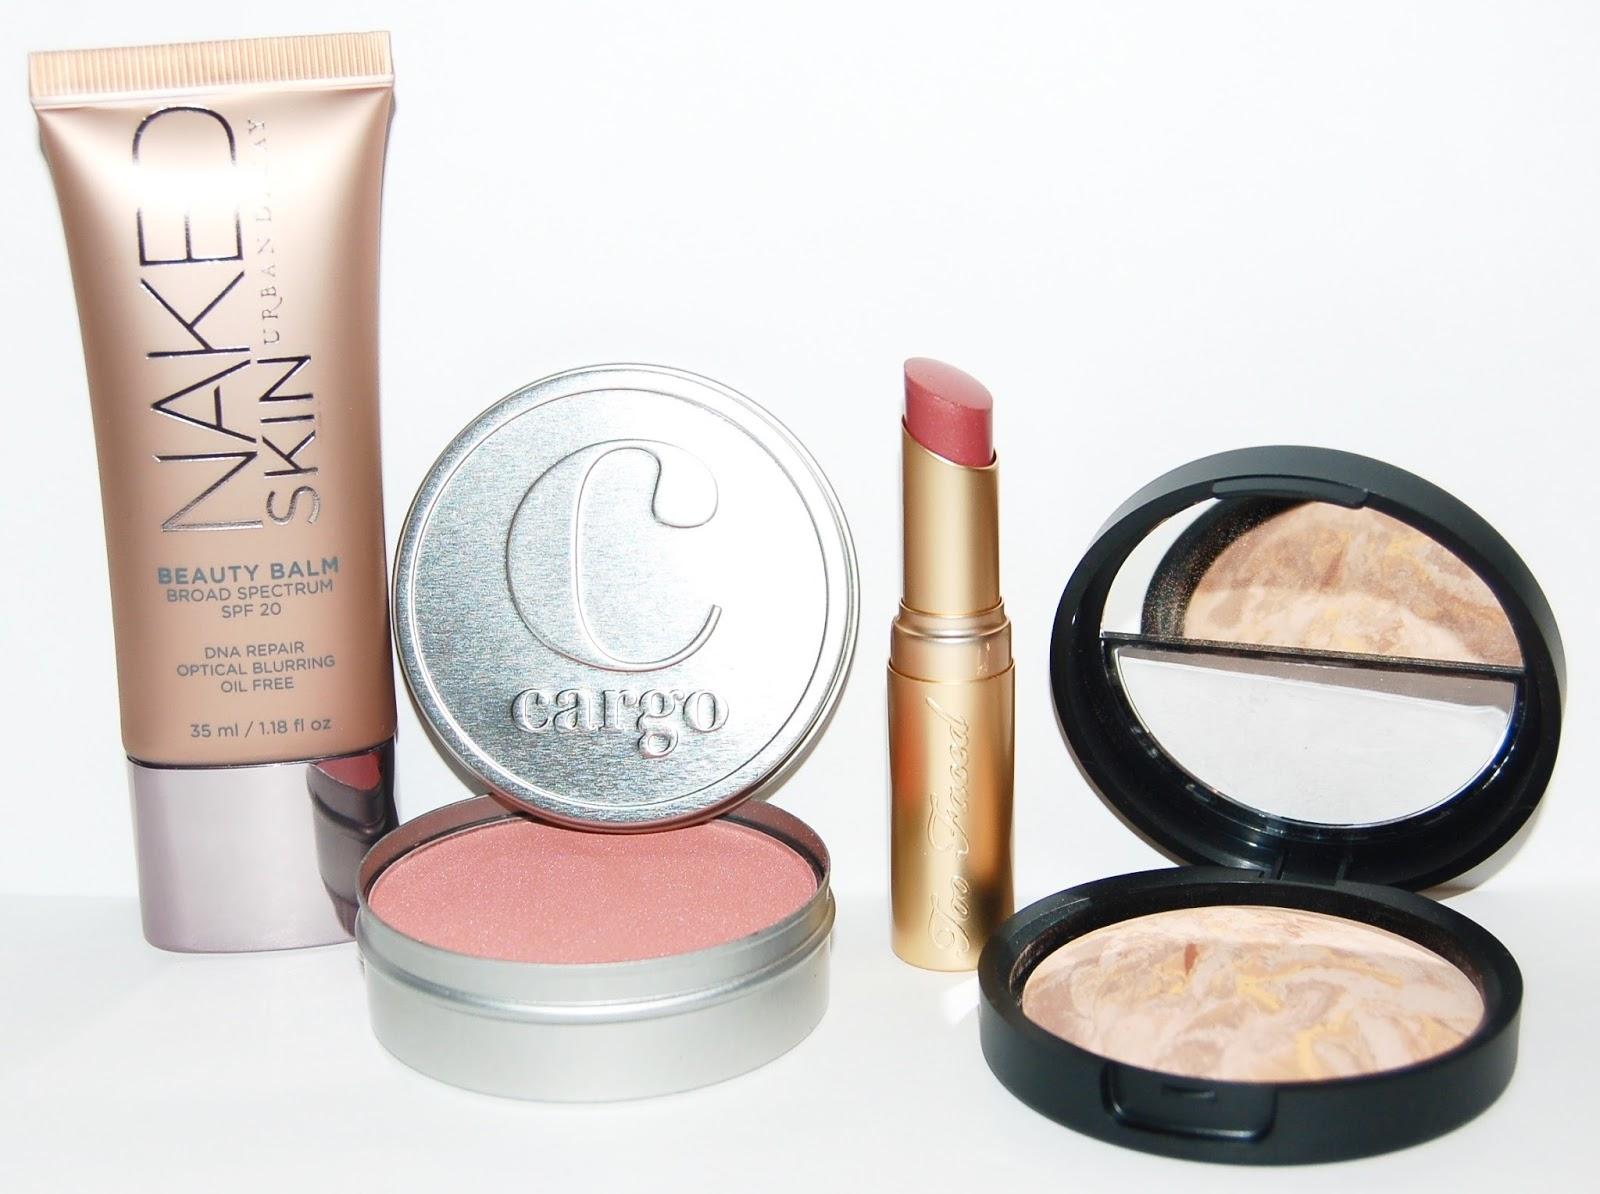 Ulta Beauty 21 Days of Beauty Sale